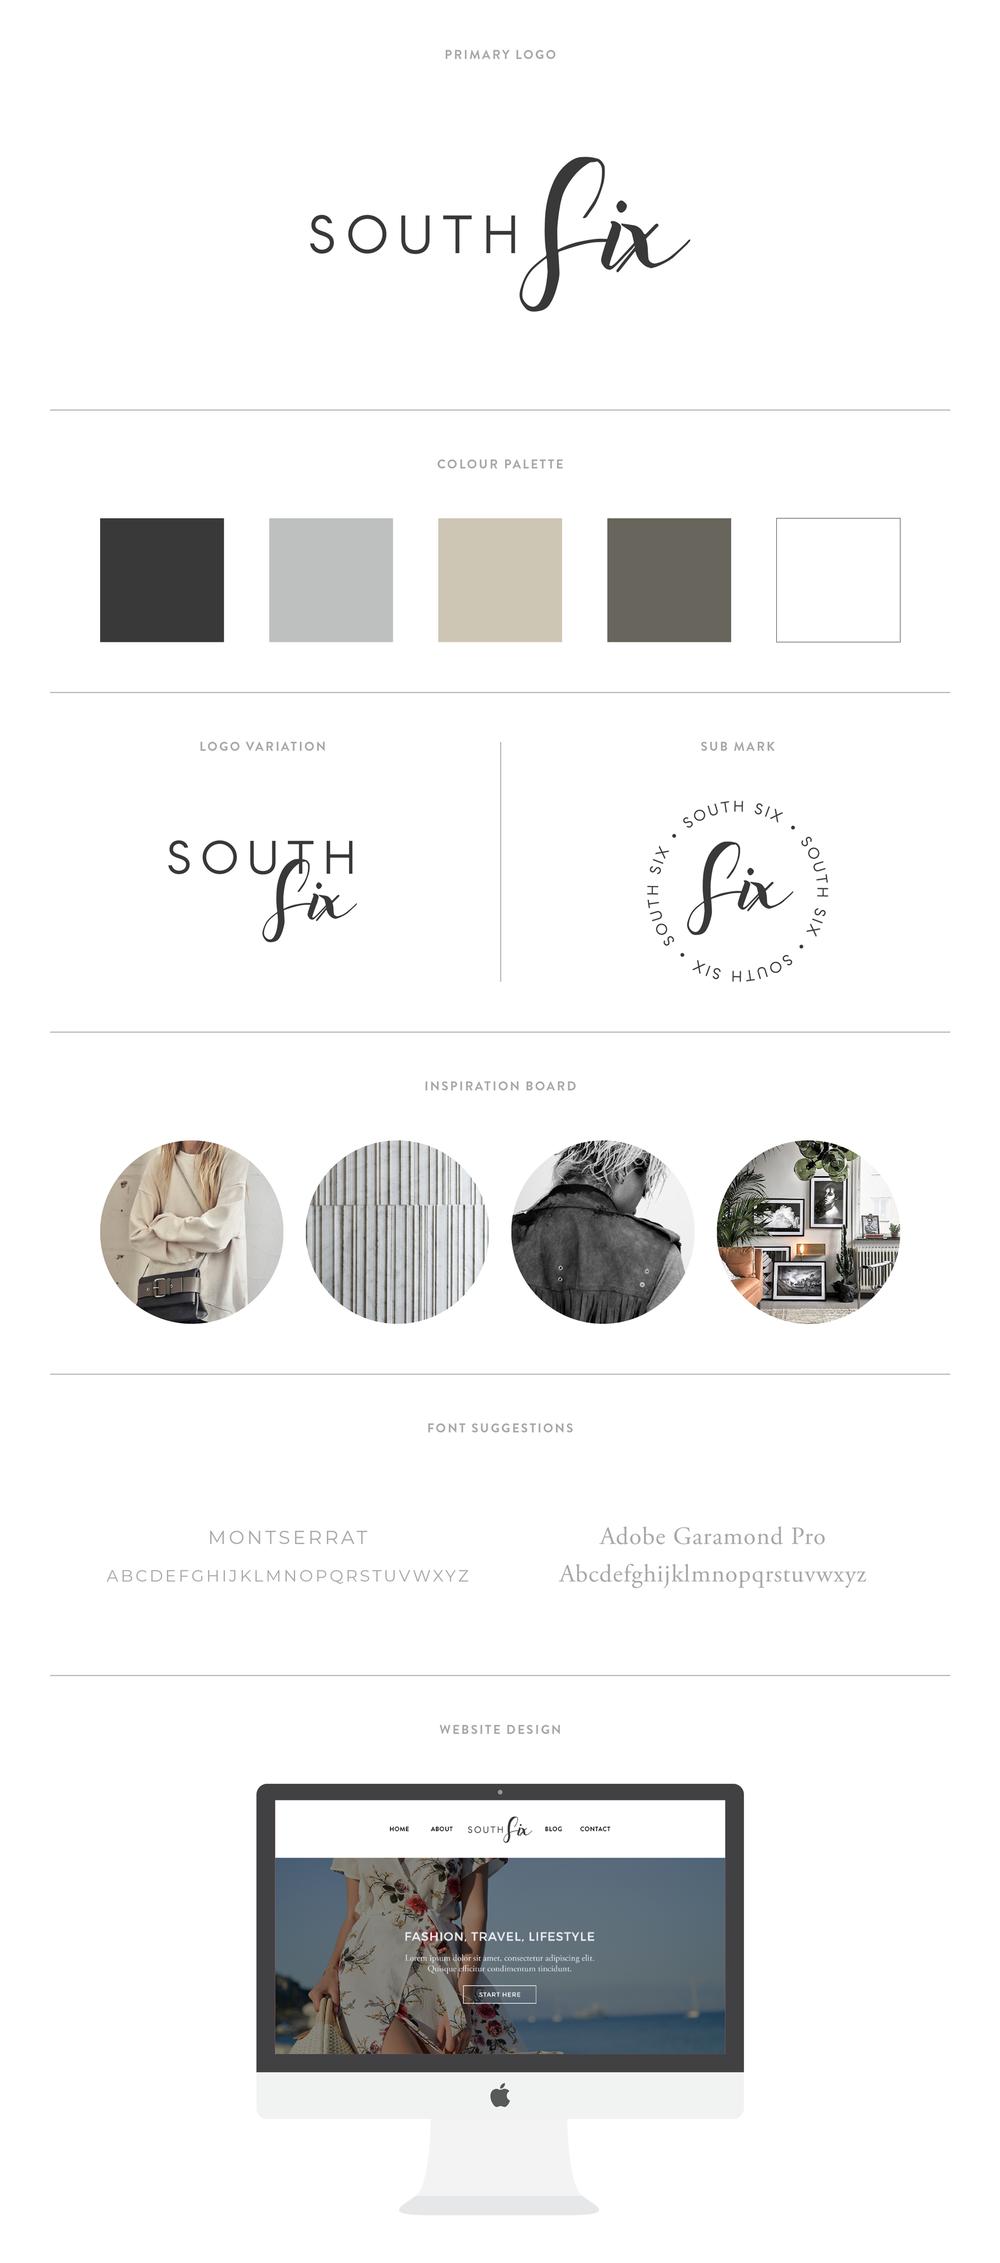 South-Six-Brand-Logo-Design-Web-Graphic-Jesseca-Stewart-Lola-Design-Company-Freelance.png